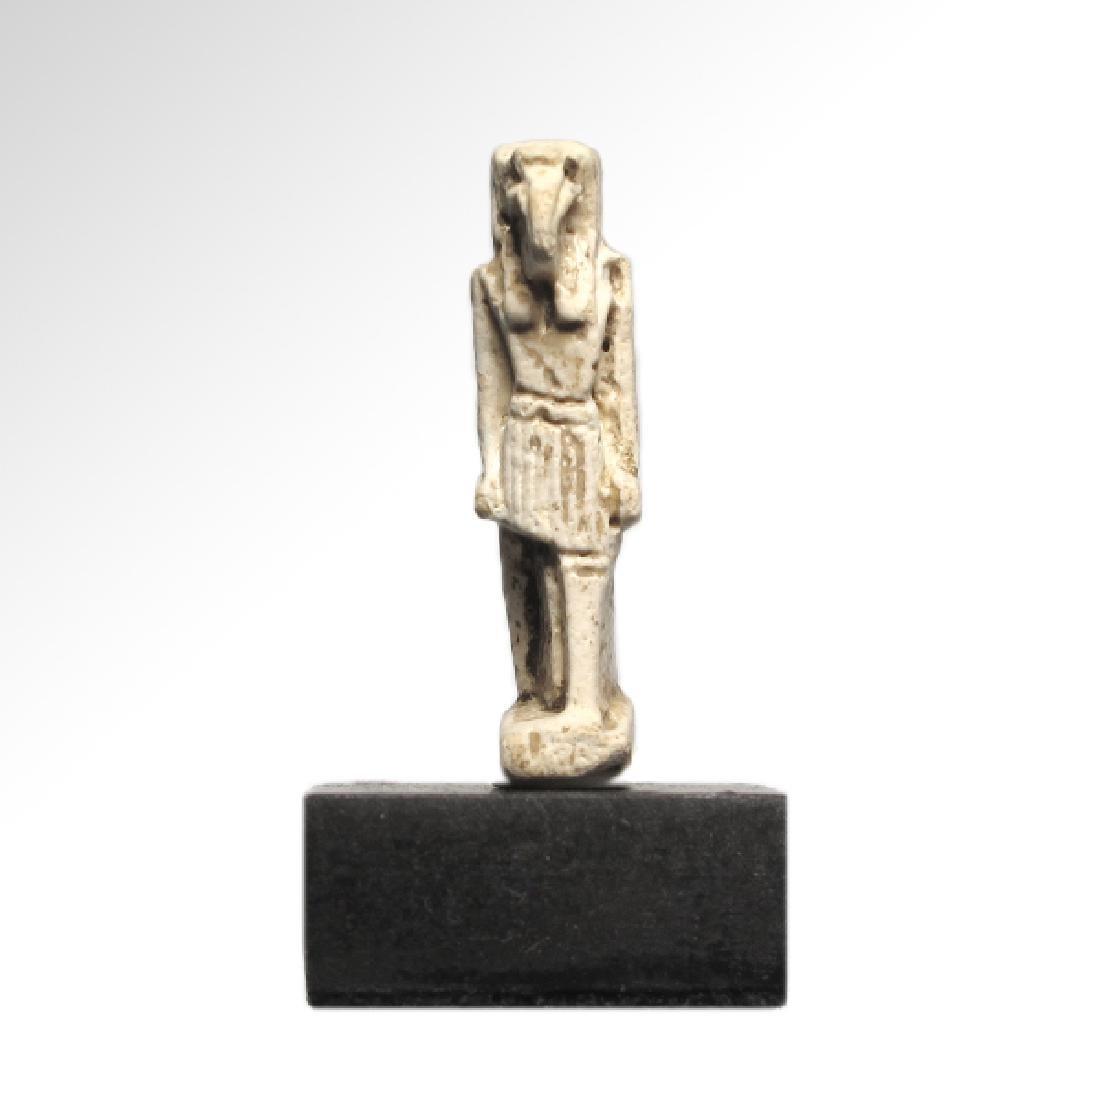 Egyptian Faience Figure of the Ibis-Headed God, Thoth